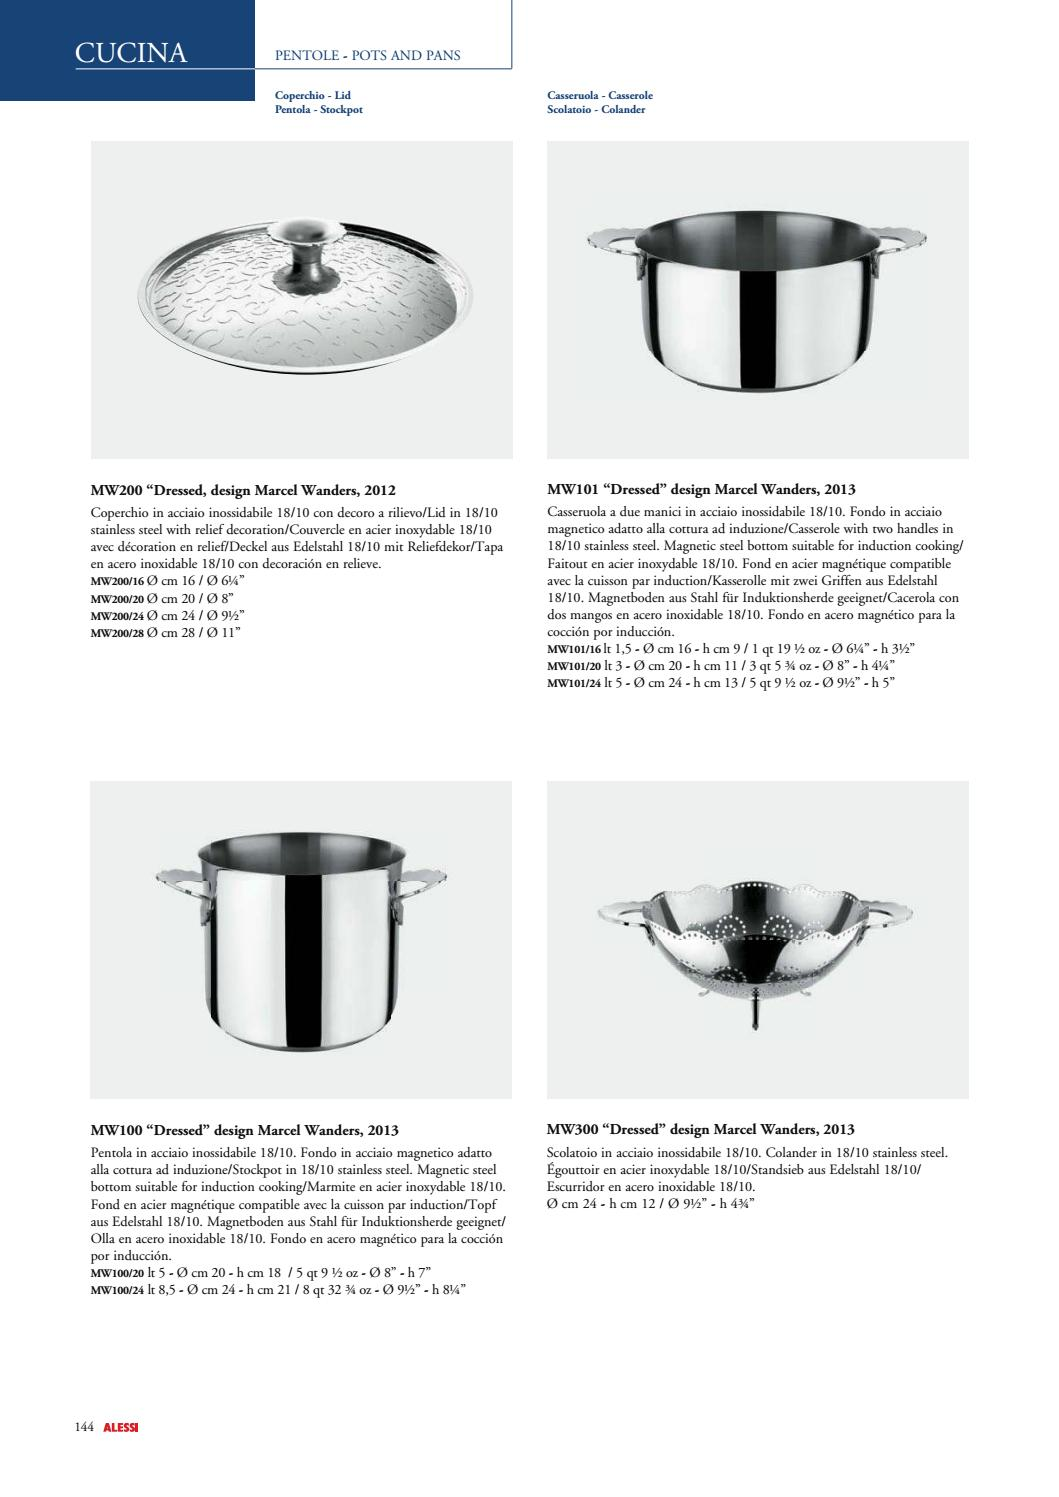 Alessi Dressed Casserole 2 Handles /Ø 24 Stainless Steel